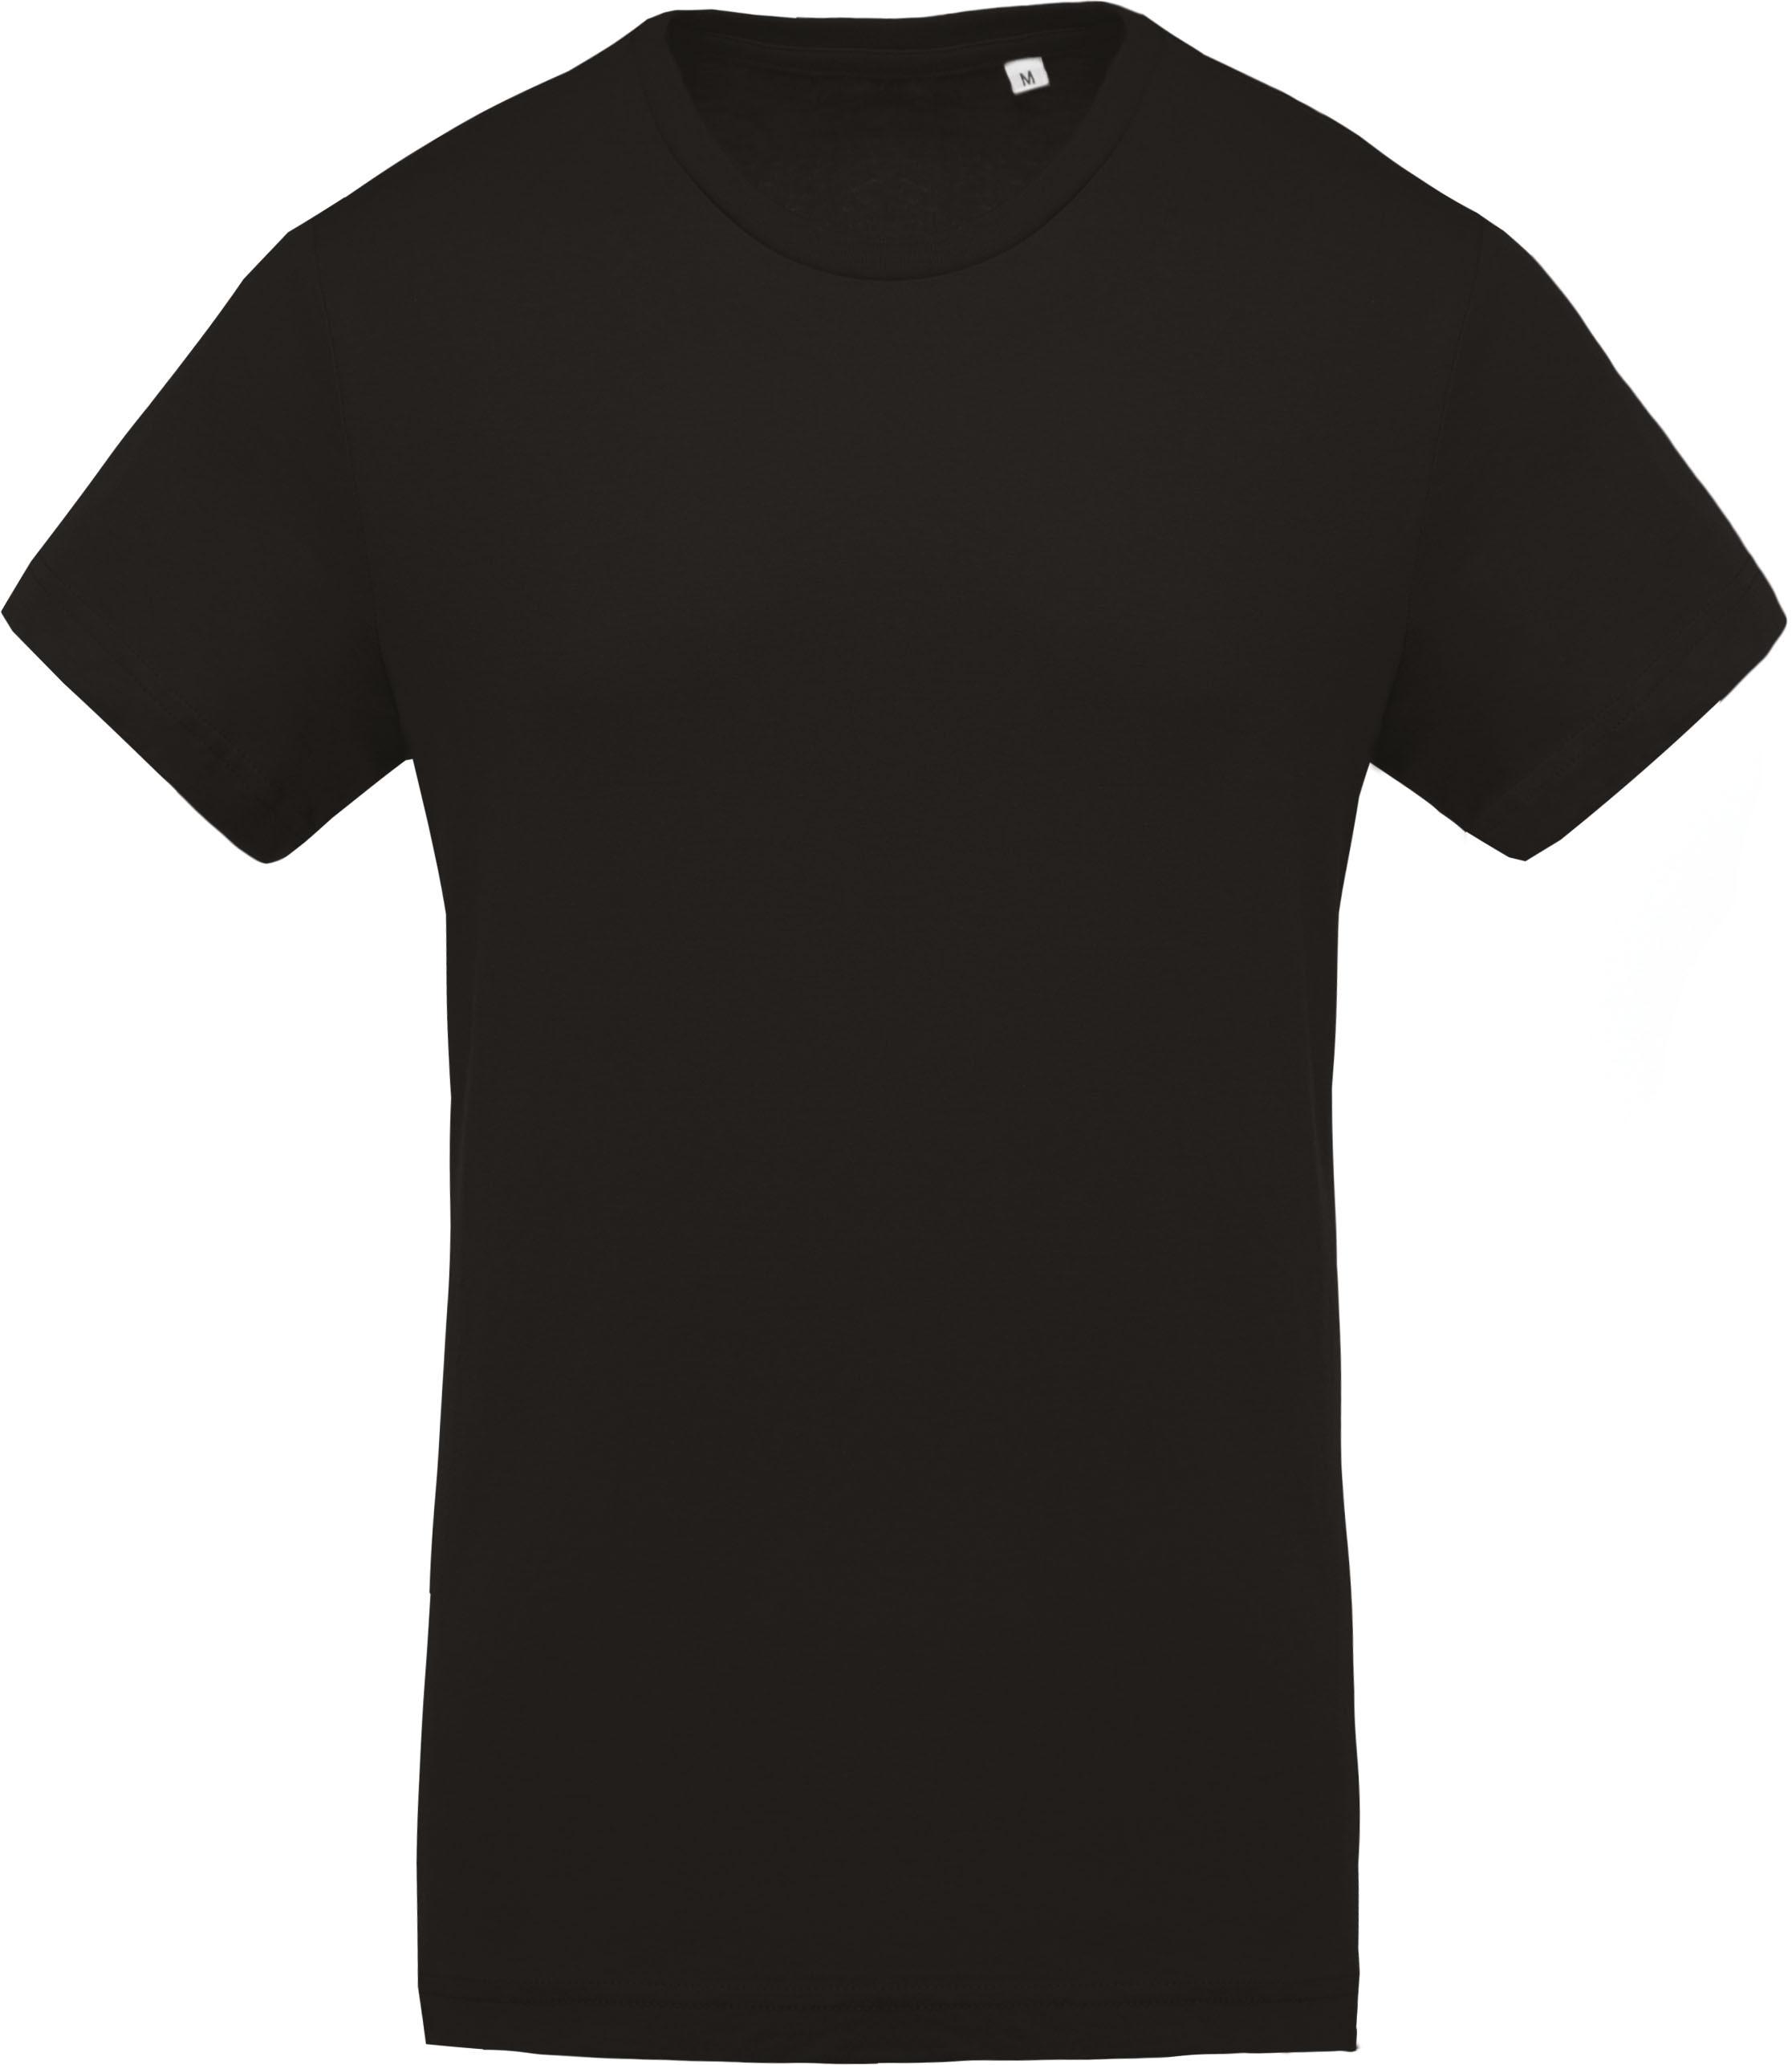 Kariban T-shirt coton BIO col rond homme